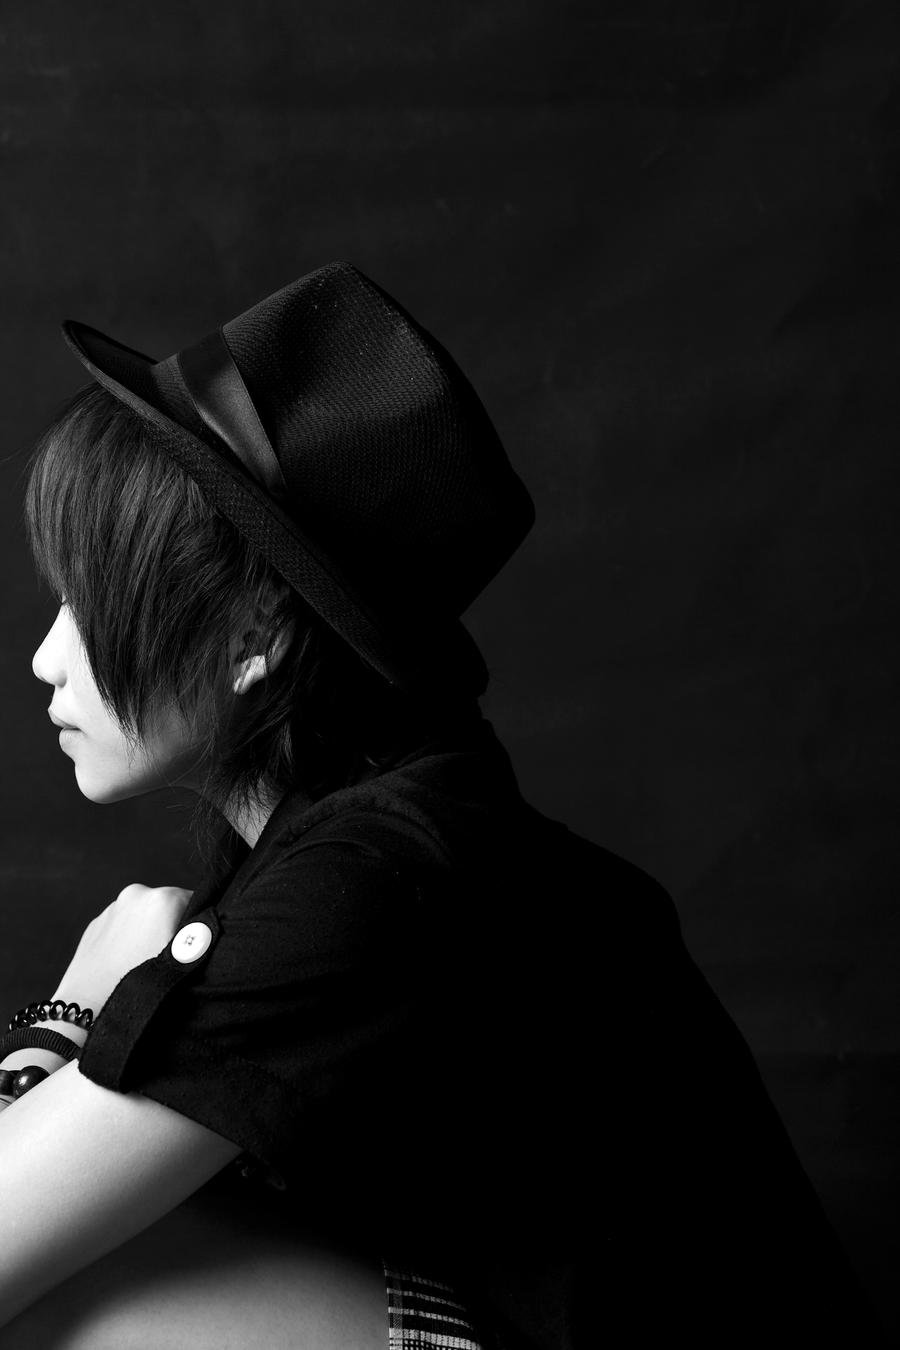 Nejigiftyholic's Profile Picture